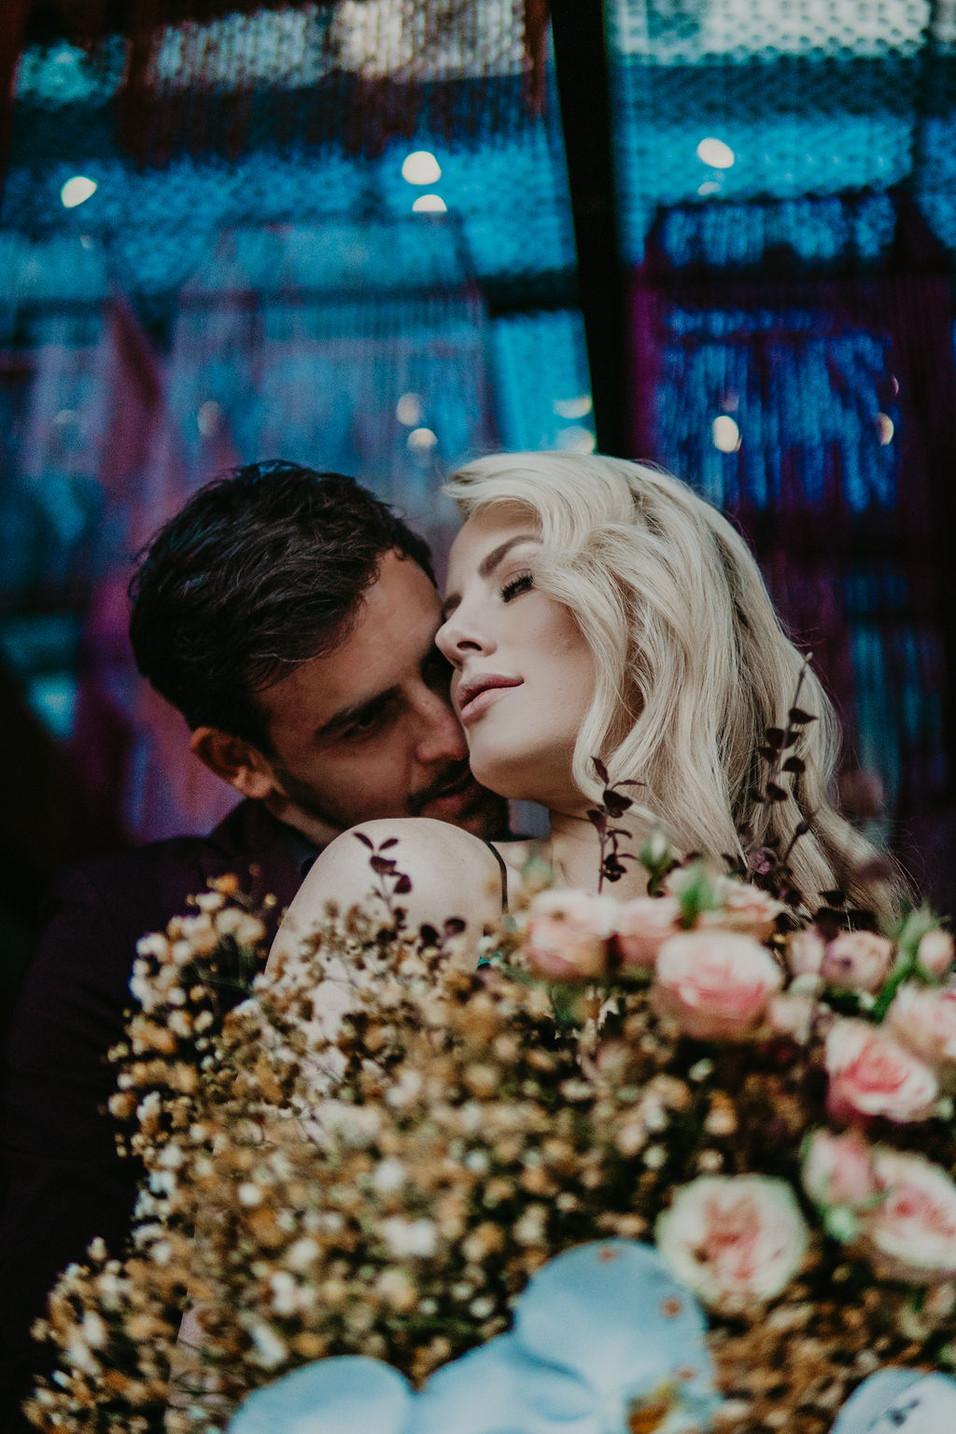 freo-urban-wedding-shoot-78.jpg